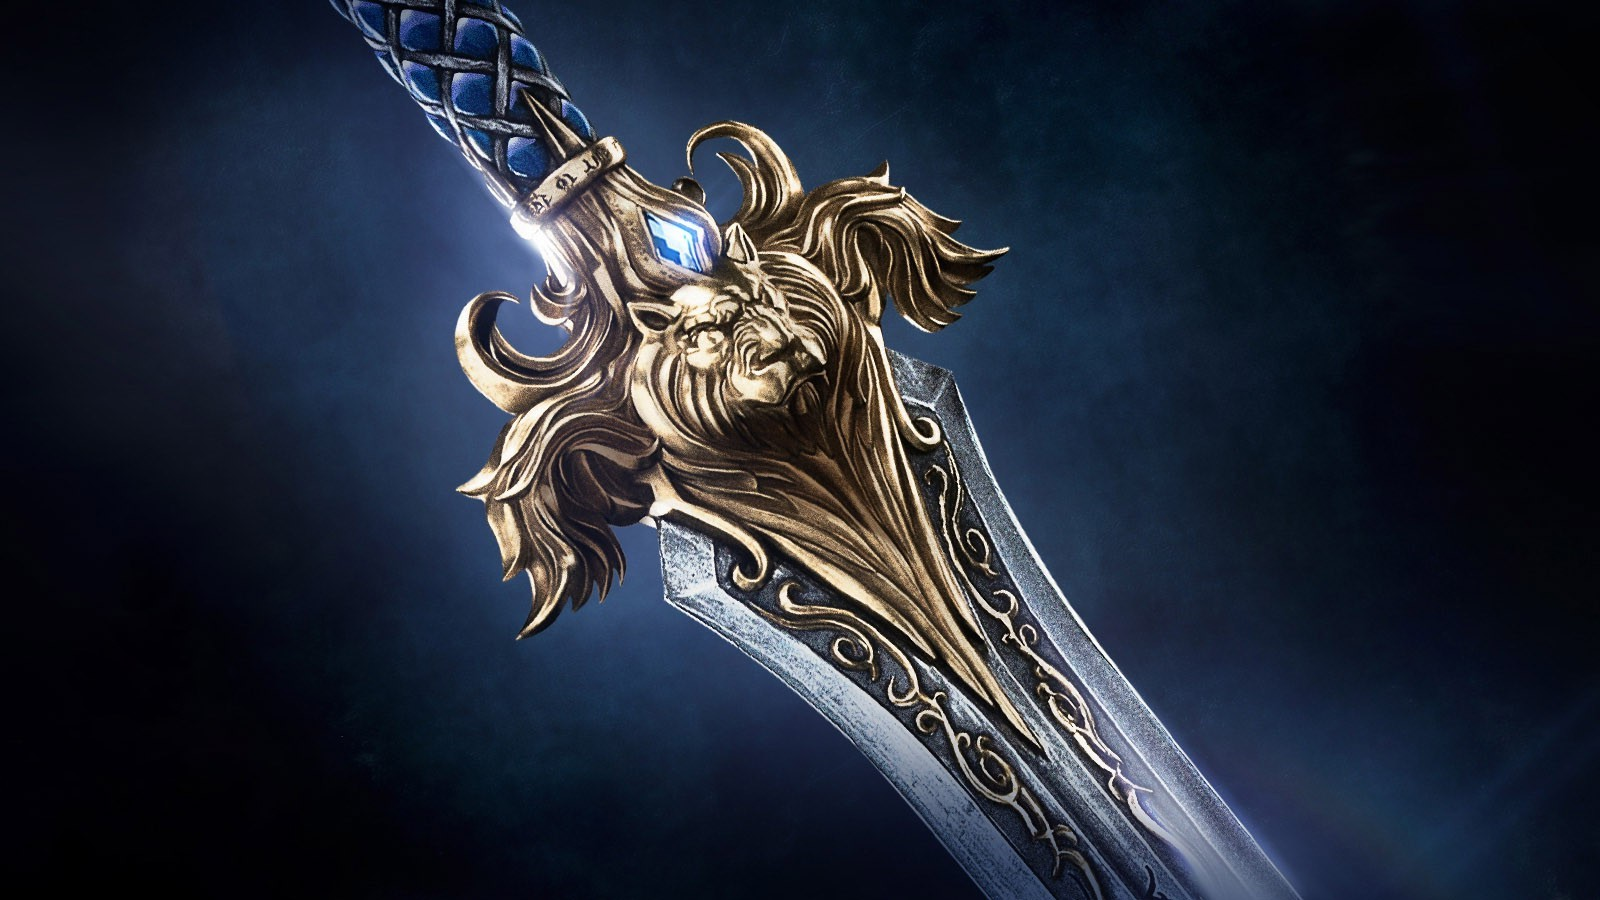 Alliance Warcraft World Of Warcraft Movies Sword Lion World Of